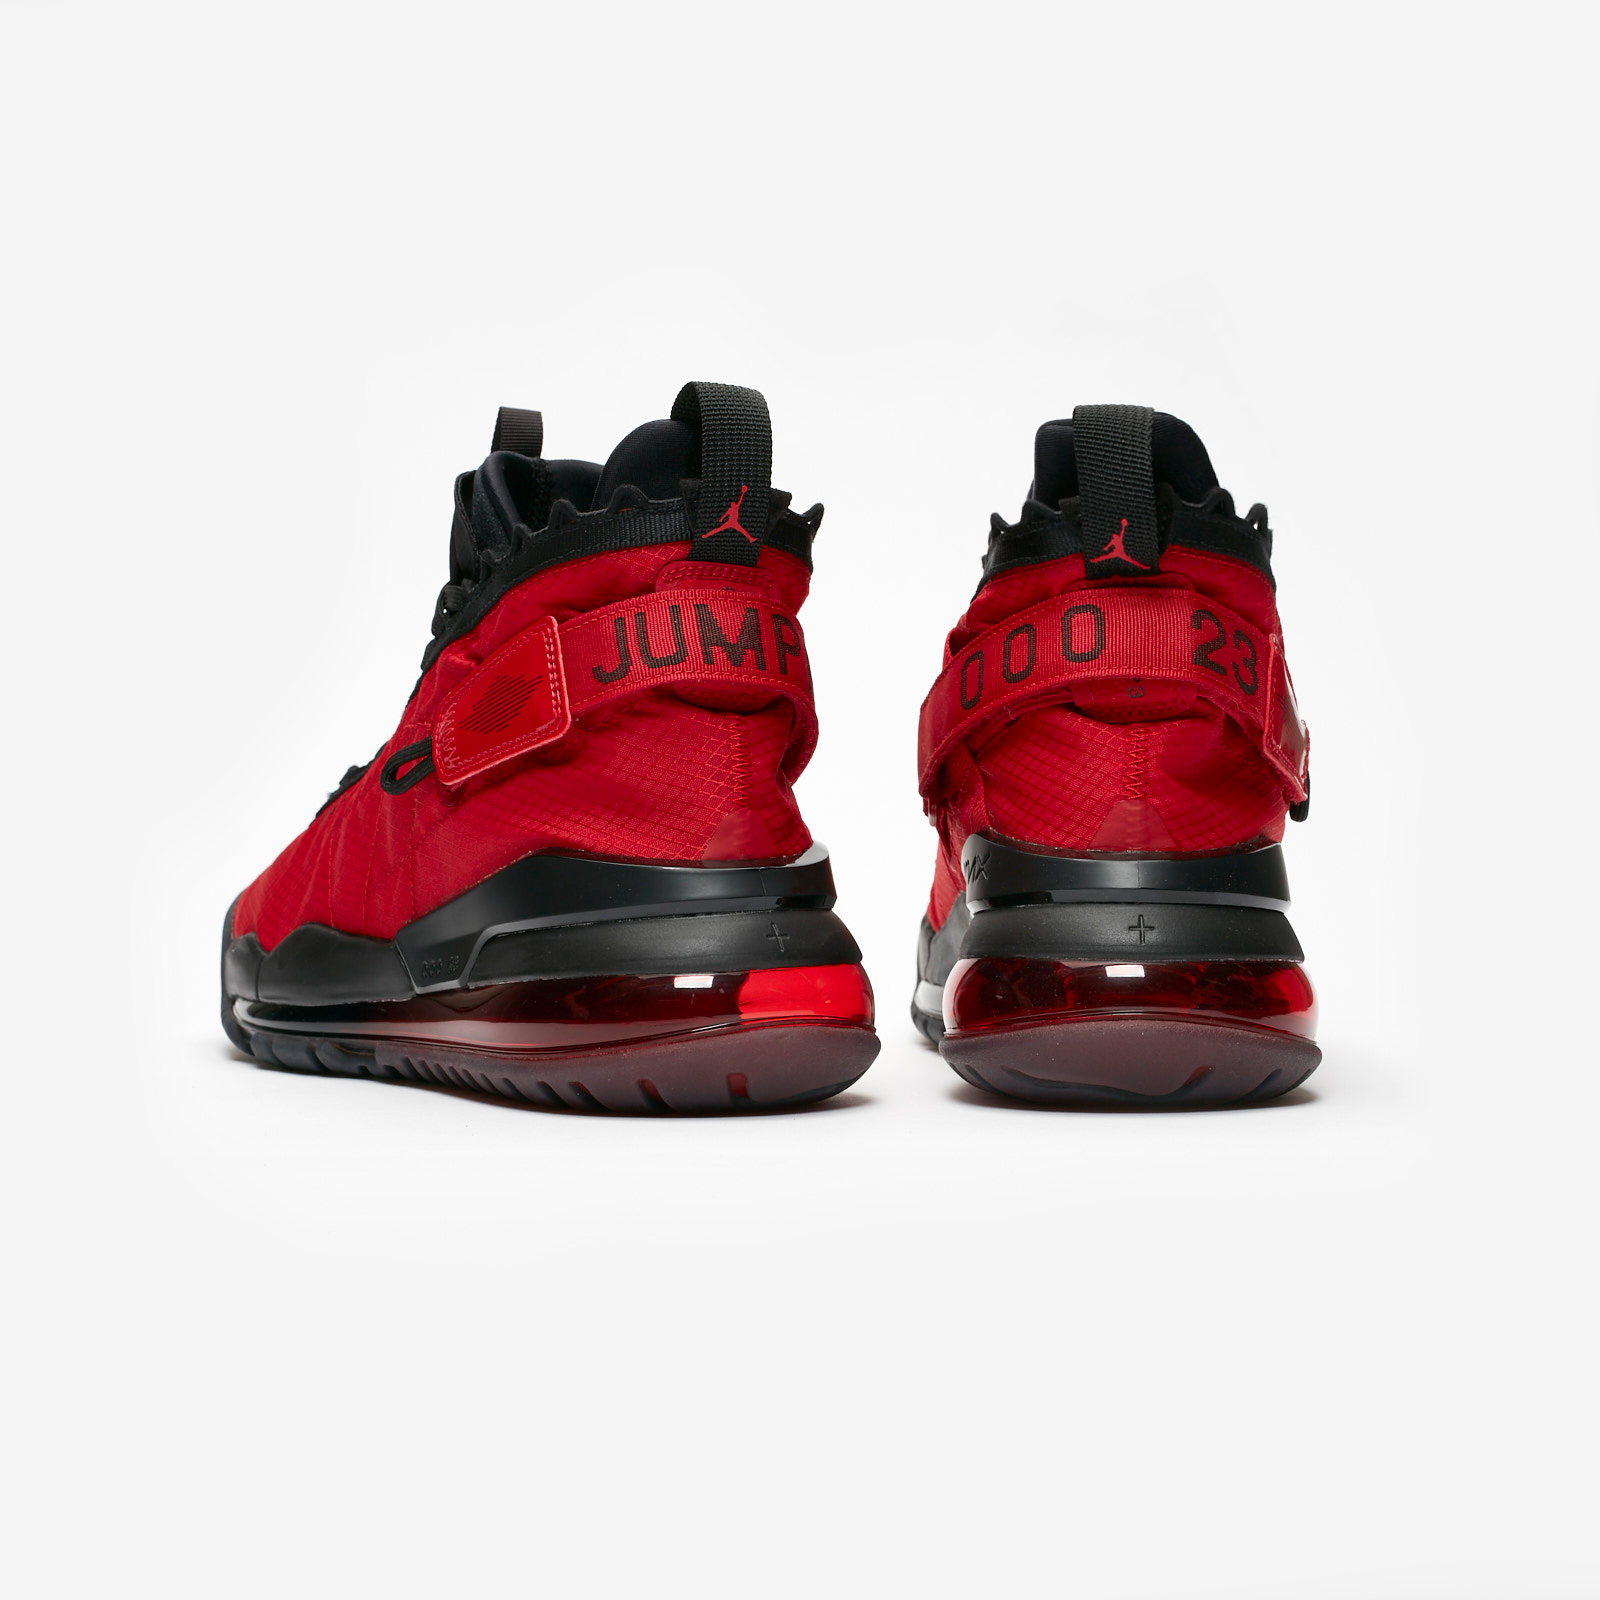 Jordan Brand Jordan Proto Max 720 Bq6623 600